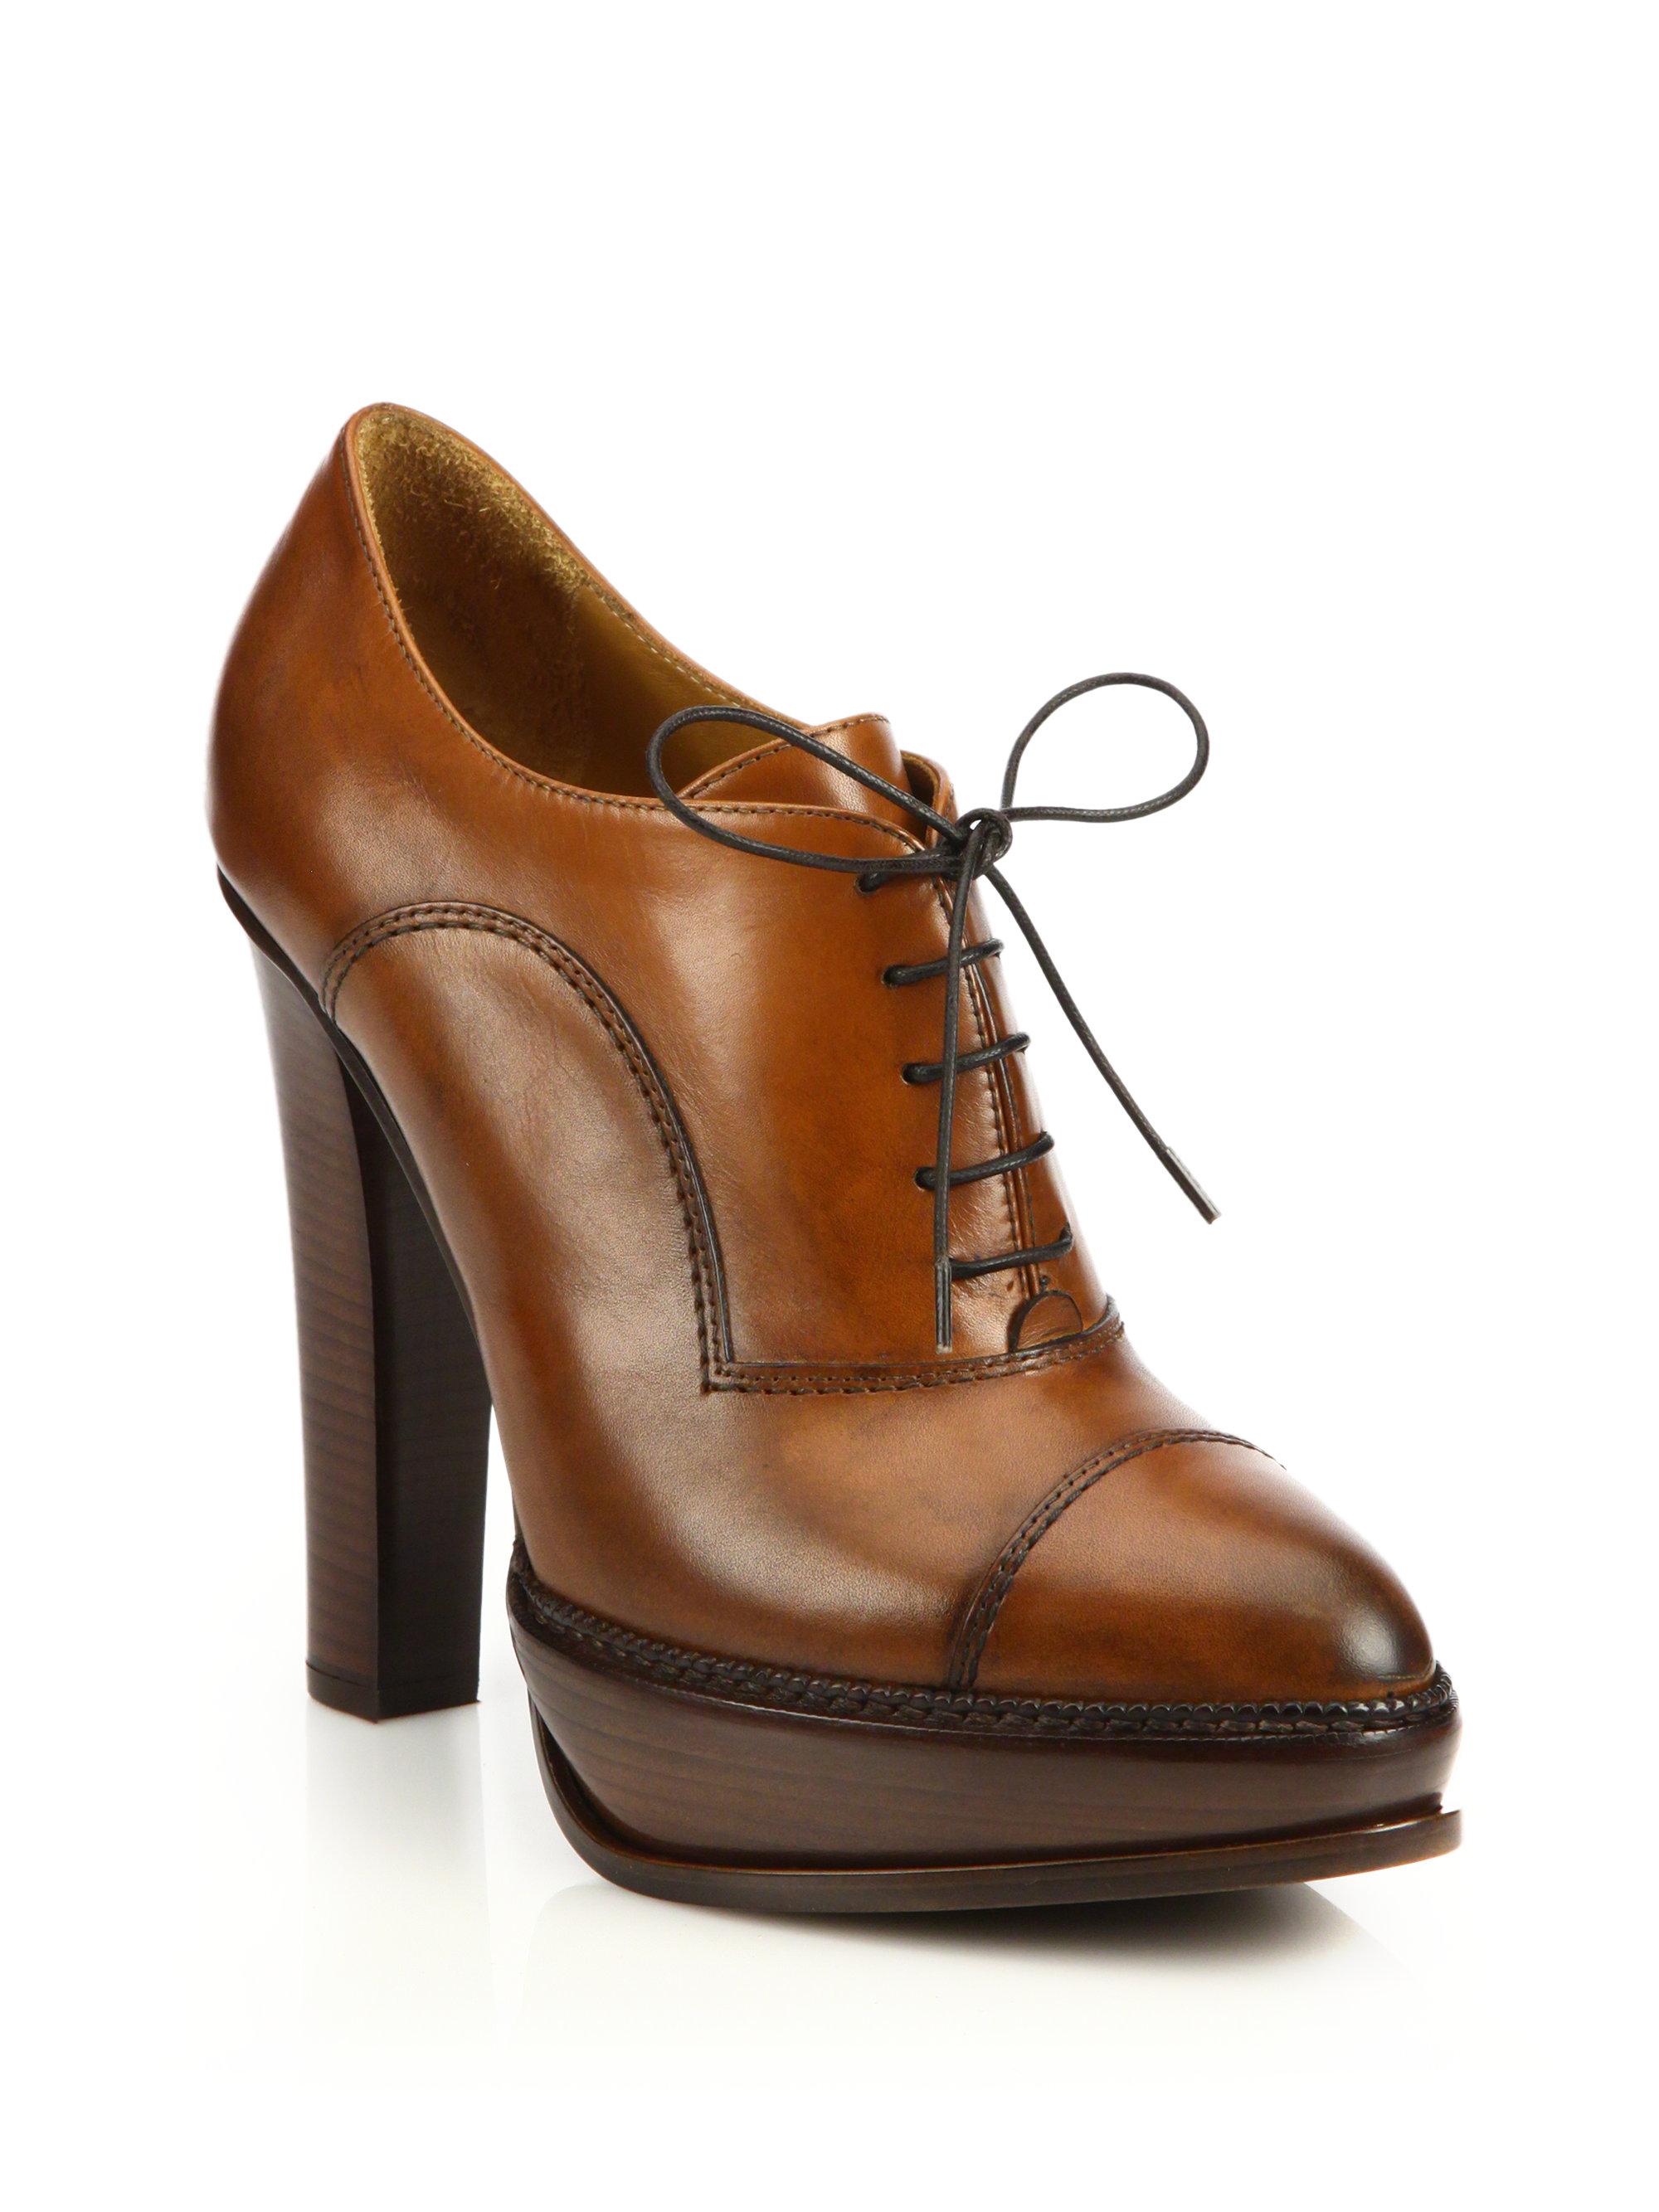 ebece422e873 Lyst - Ralph Lauren Temple Leather Oxford Platform Booties in Brown